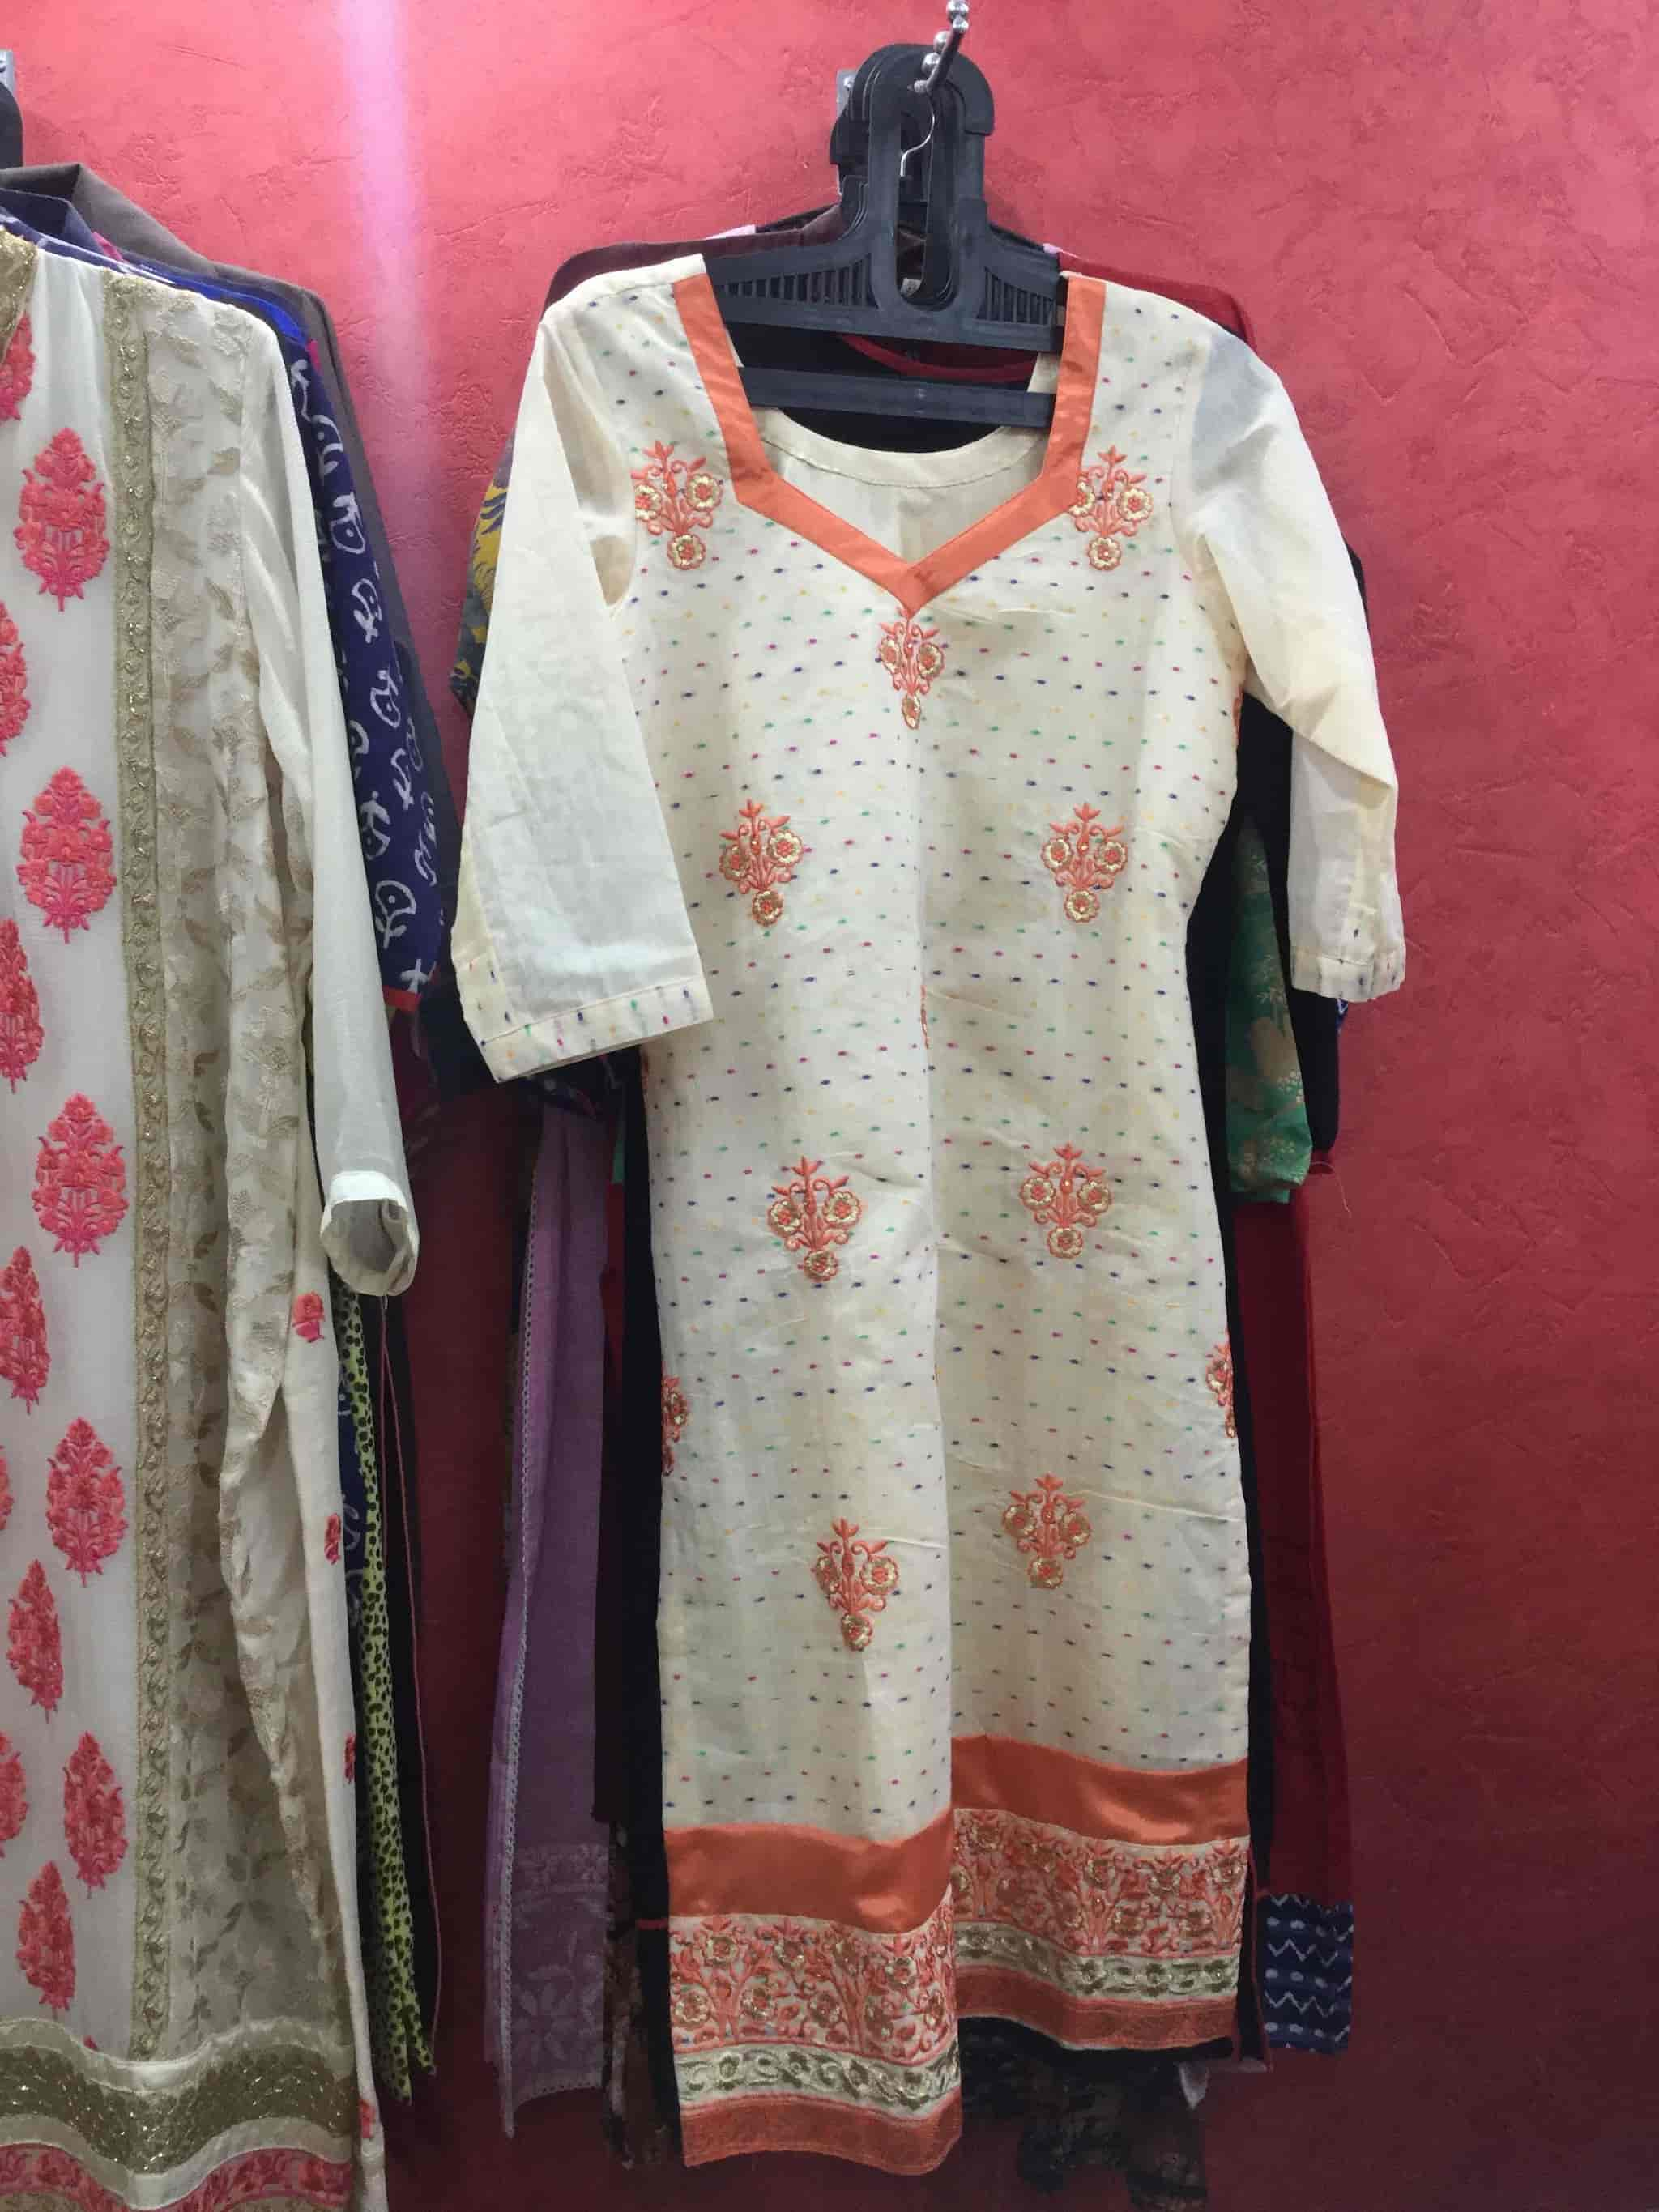 Savi Designer Boutique Photos, Sector 45c, Chandigarh- Pictures